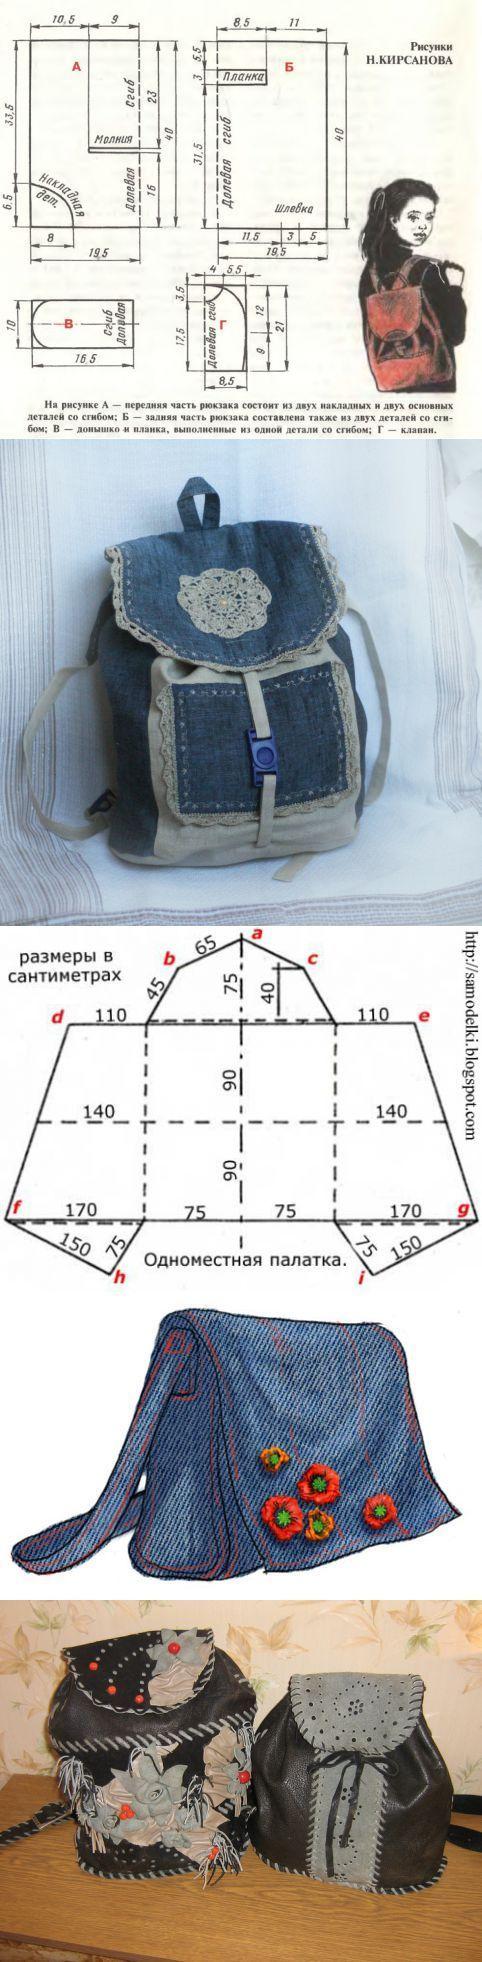 сумки шить МАК   bags   Pinterest   Patrones de costura, Patrones y ...